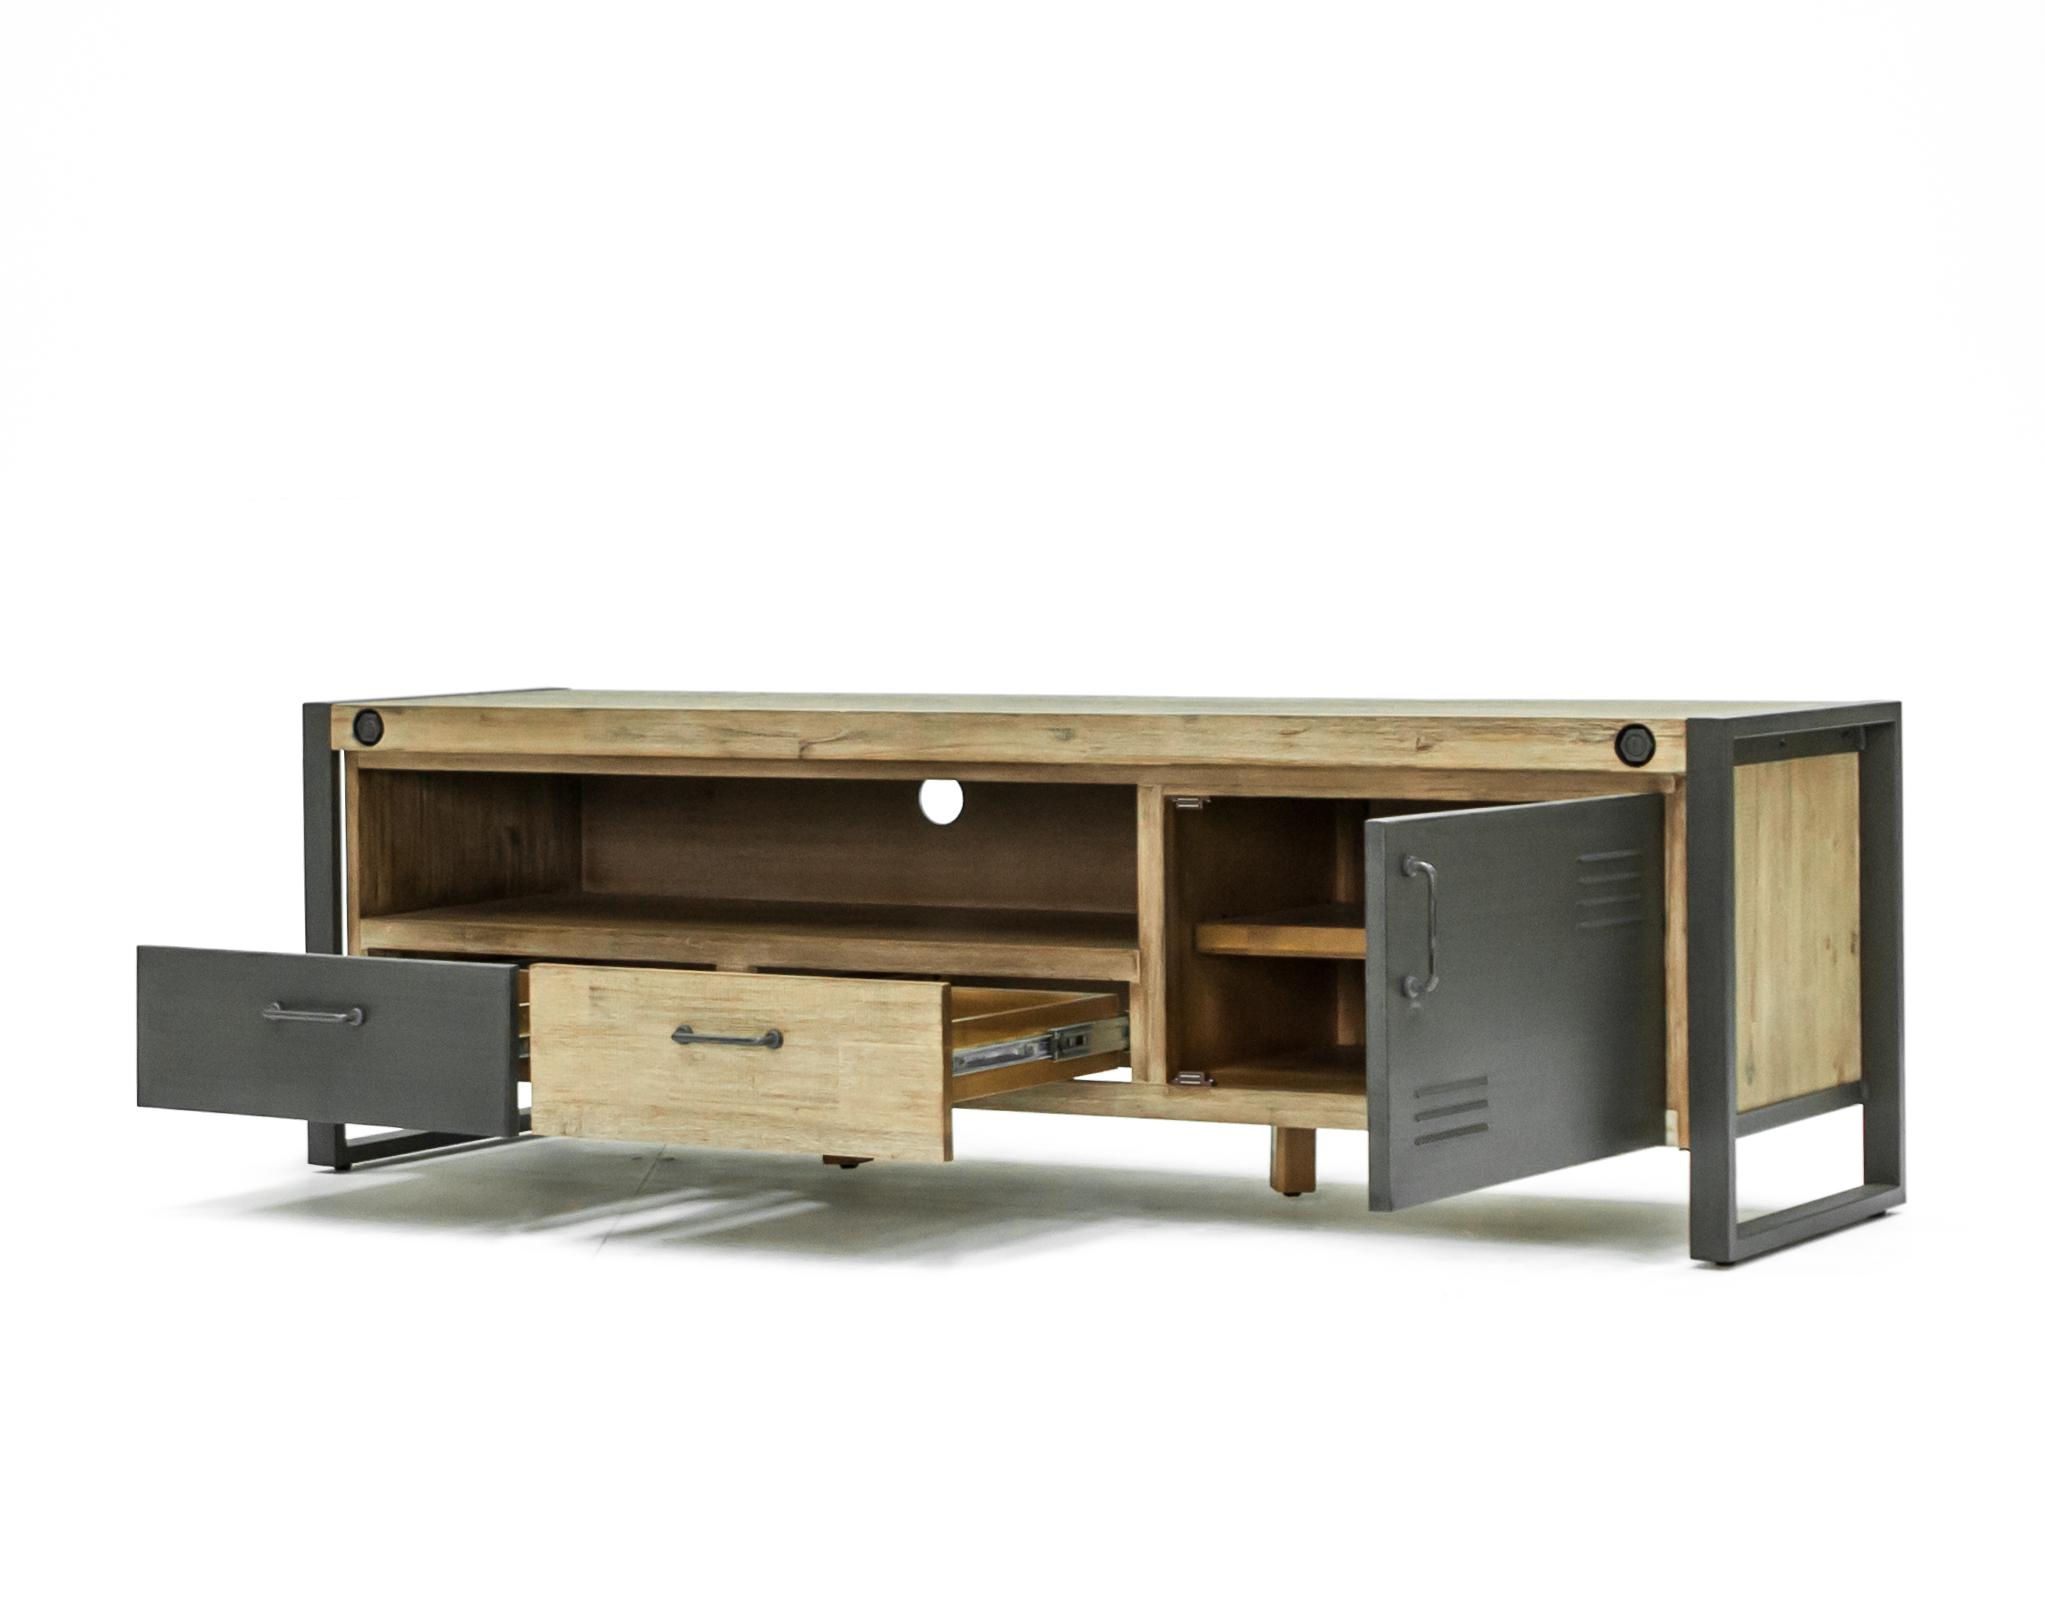 meuble tv industriel bois metal boulons brooklyn